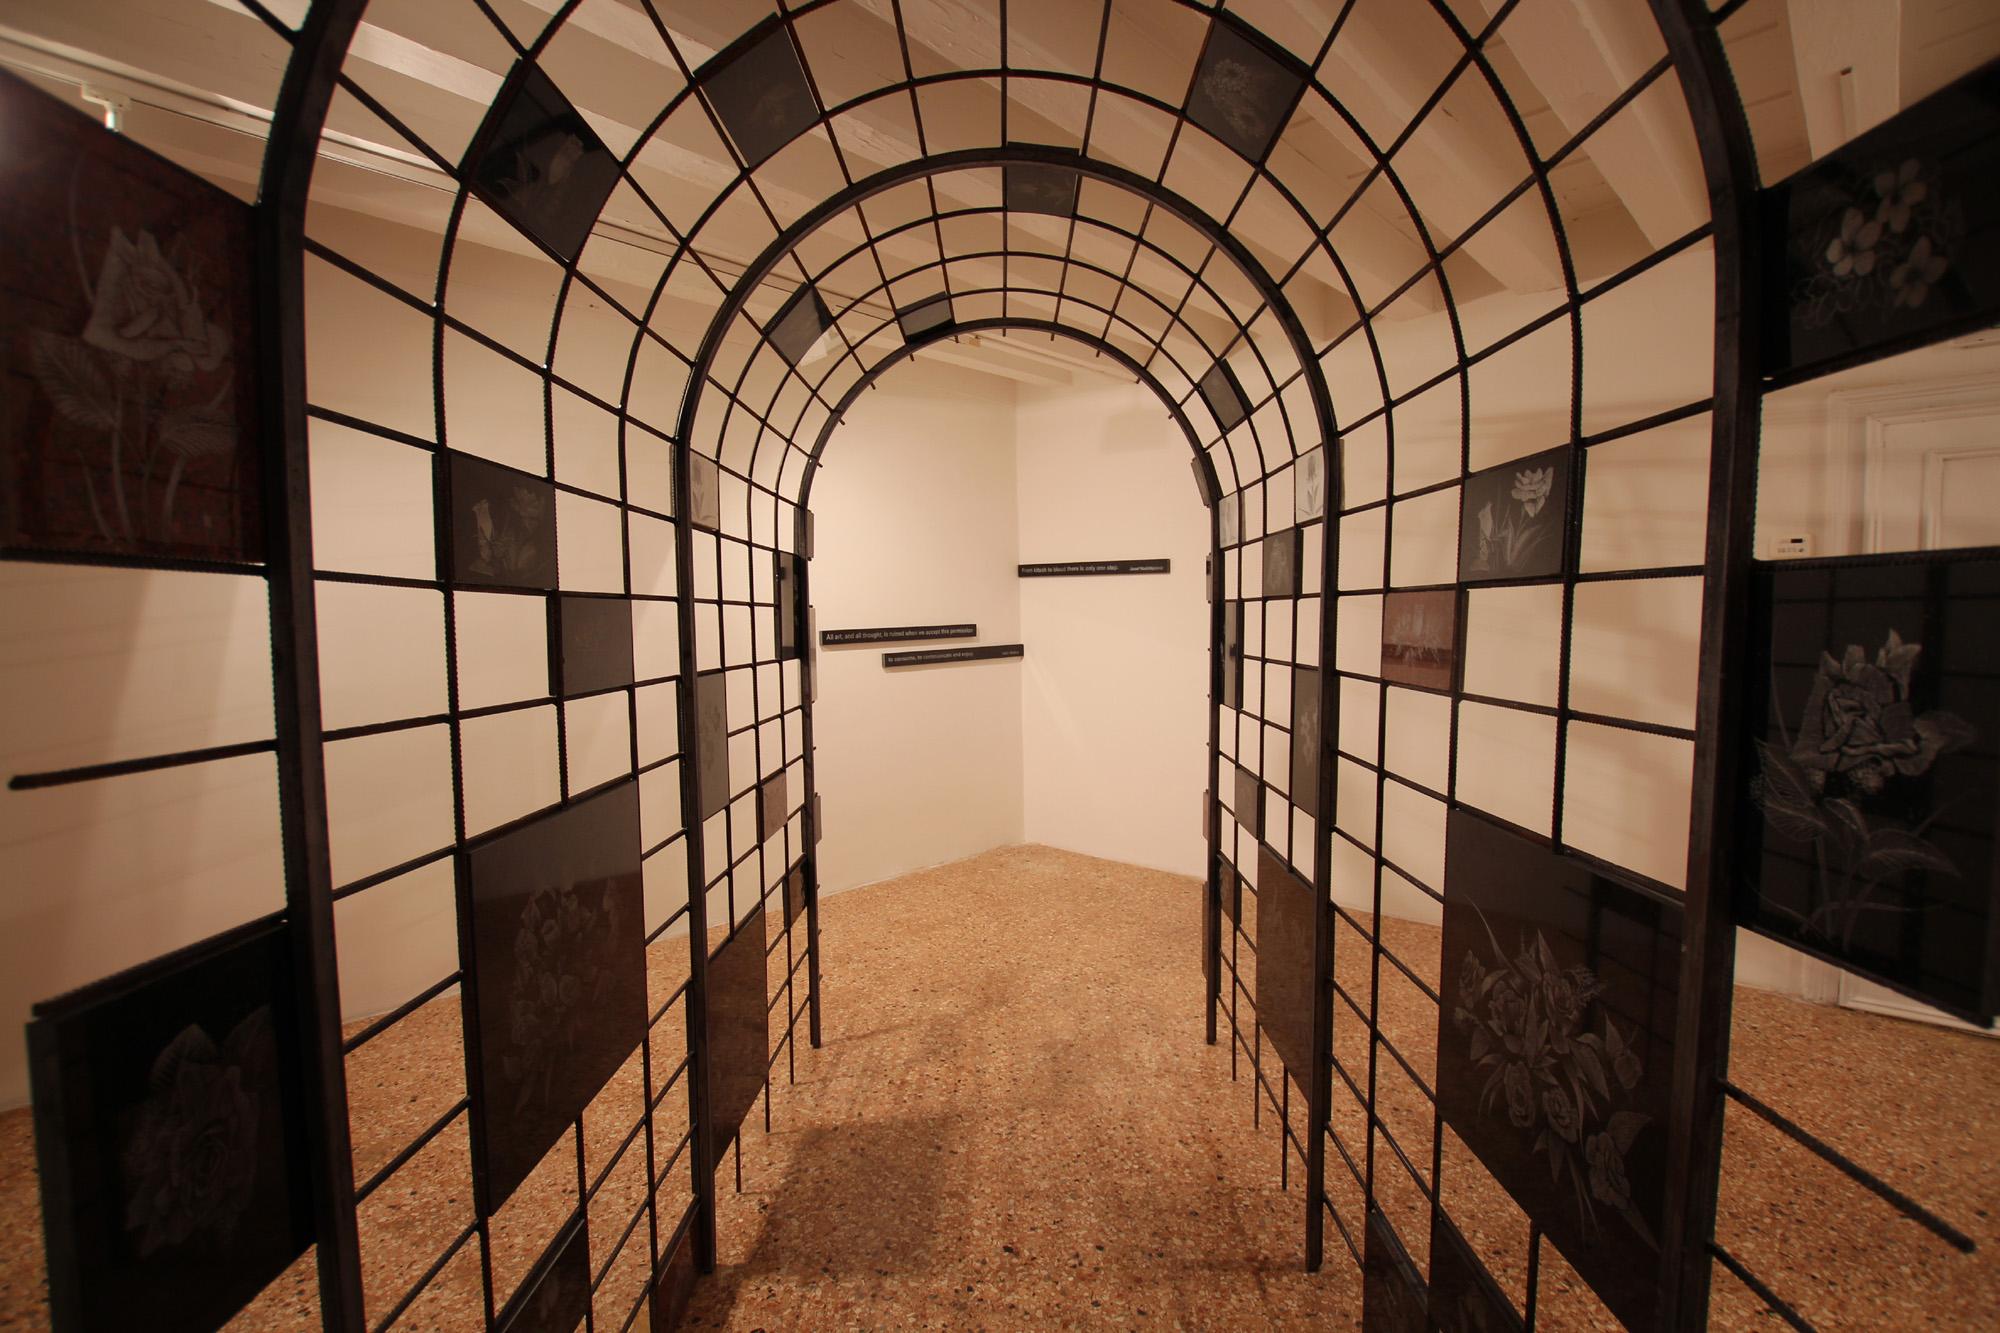 The Bosnian Pavilion at the Venice Biennale (Photo Andrea Rossini)